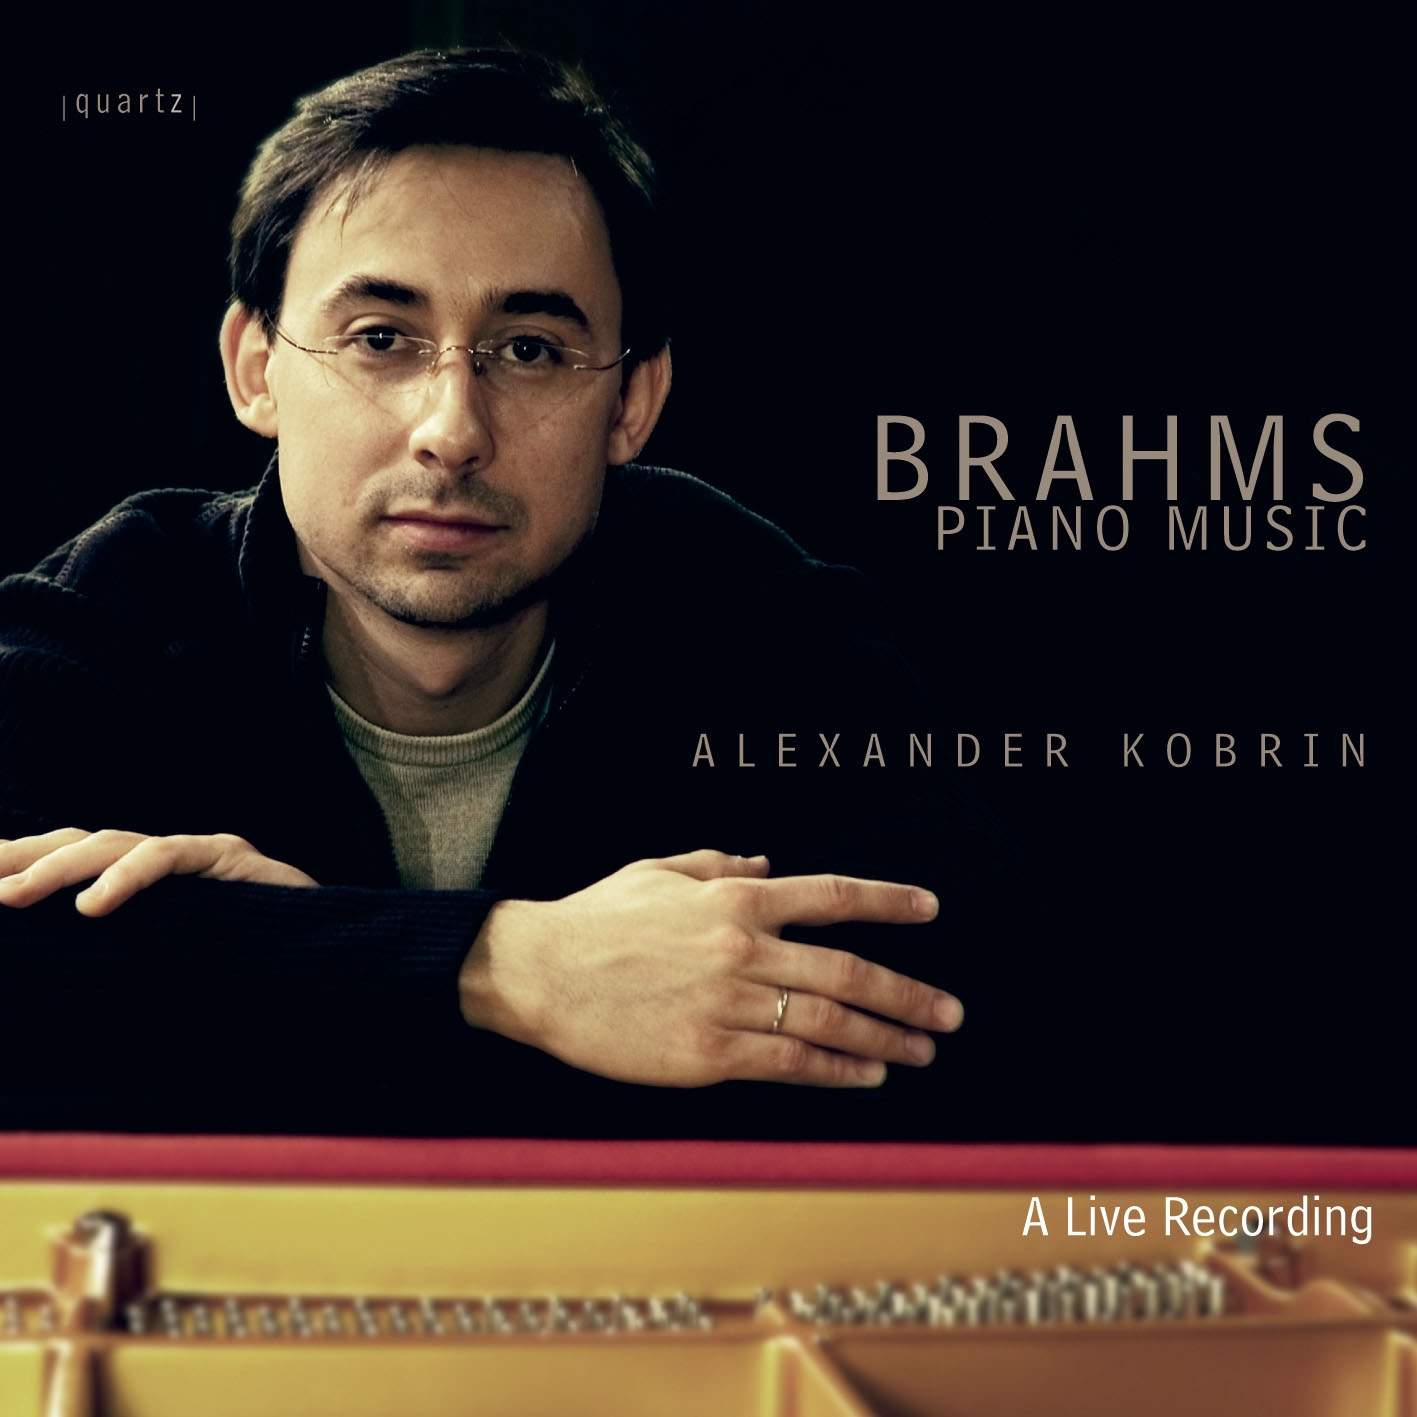 Alexander Kobrin - Piano